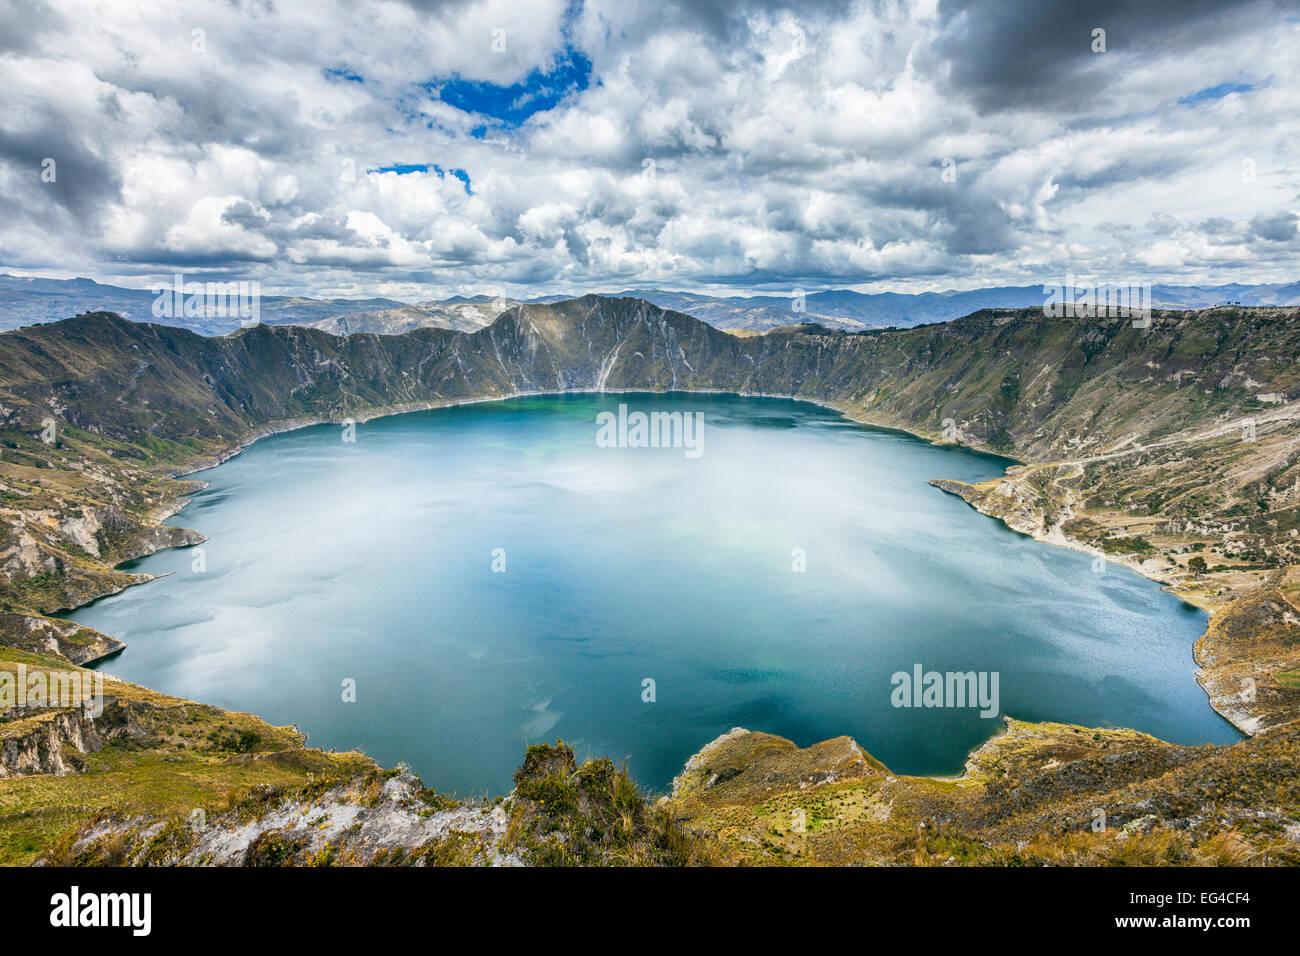 Quilota Crater Lake Provinz Cotopaxi Ecuador September 2010. Stockbild